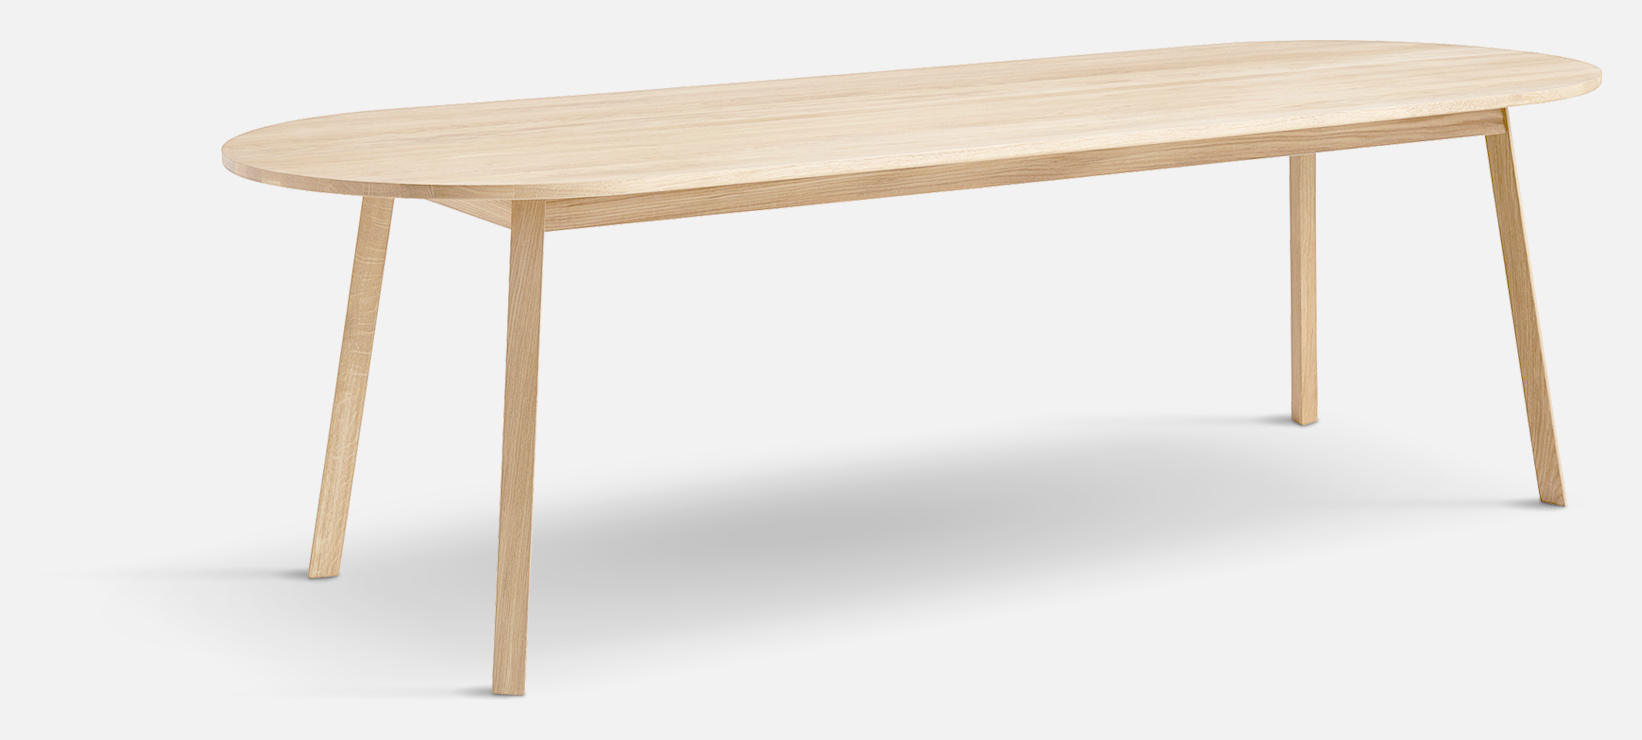 matbord hay Triangle Matbord från HAY | Olsson & Gerthel matbord hay